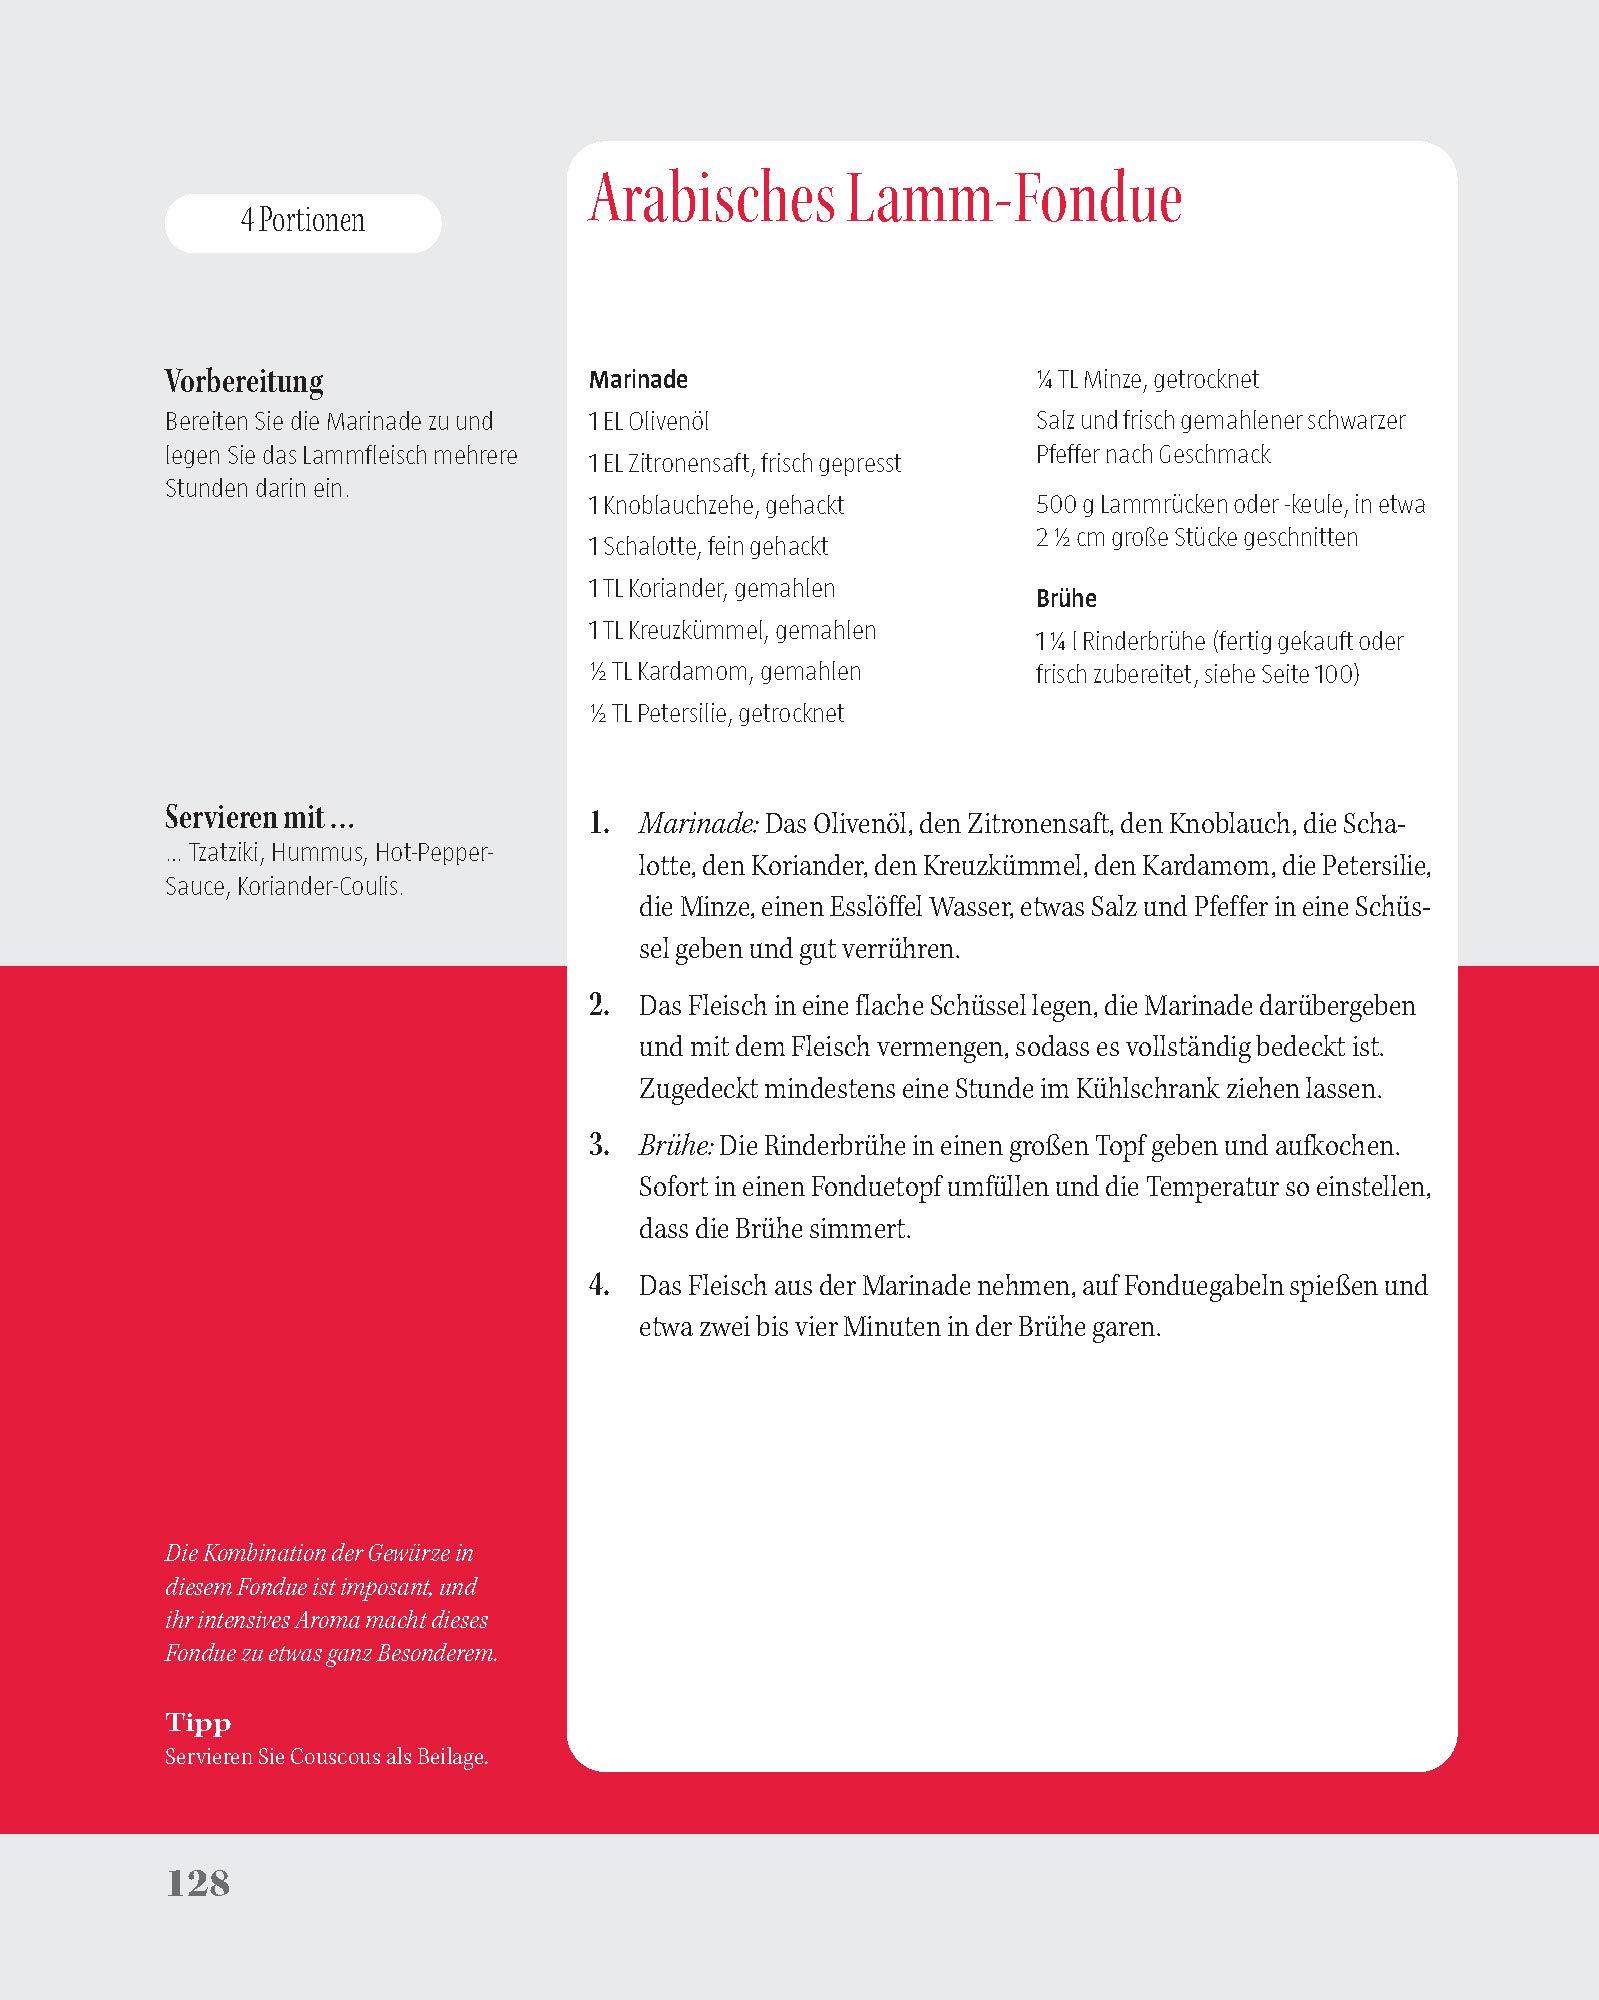 Fondue Nichts Für Spießer Simon Ilana 9783868524574 Amazon Com Books